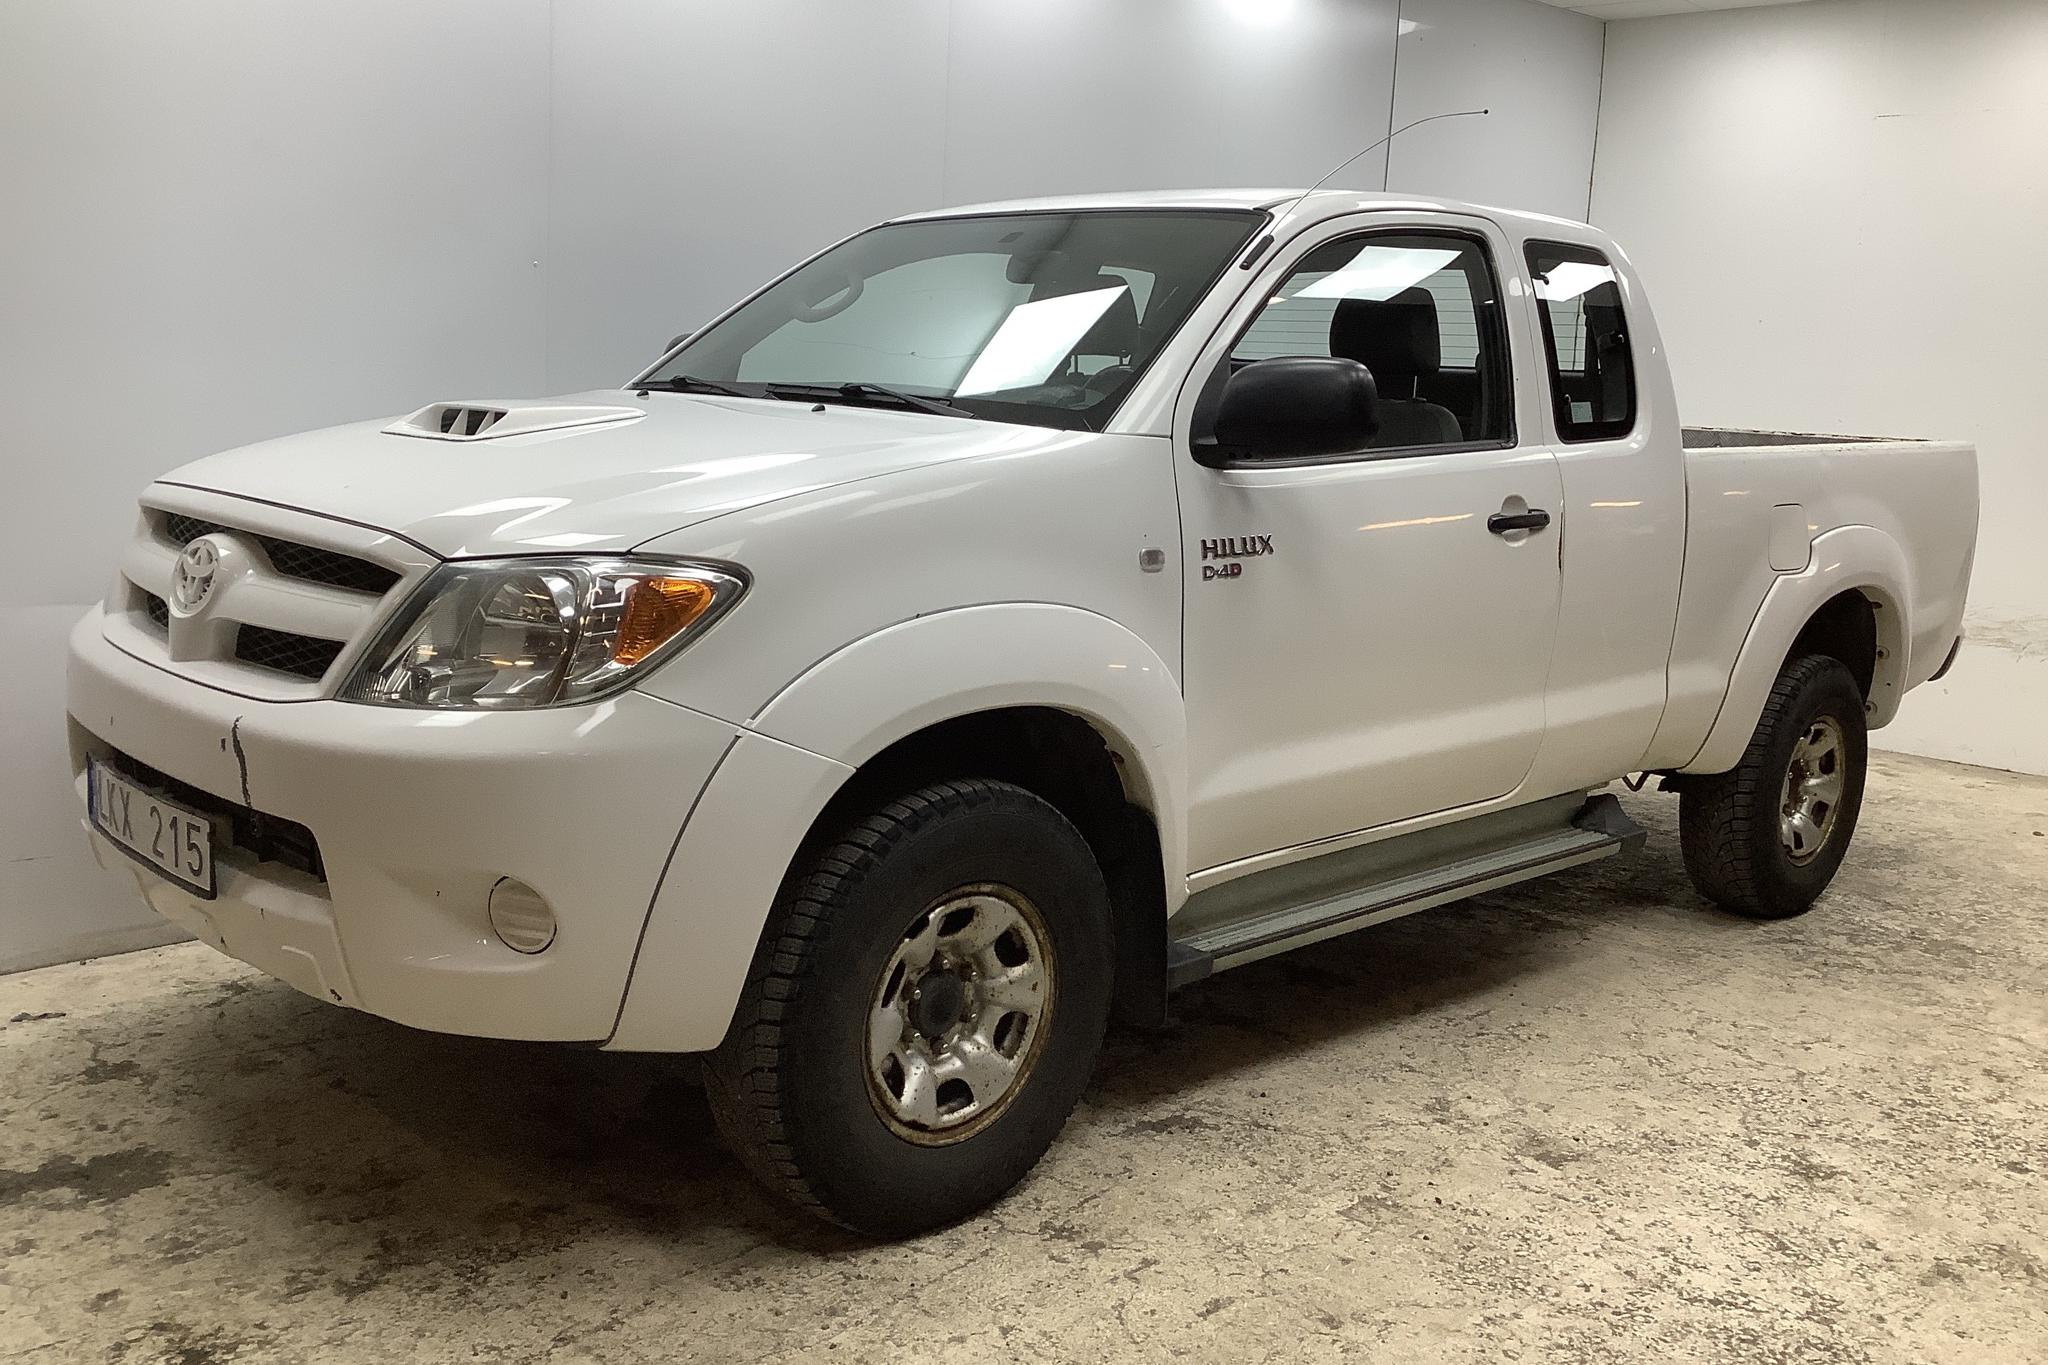 Toyota Hilux 2.5 D-4D 4WD (120hk) - 195 830 km - Manual - white - 2008